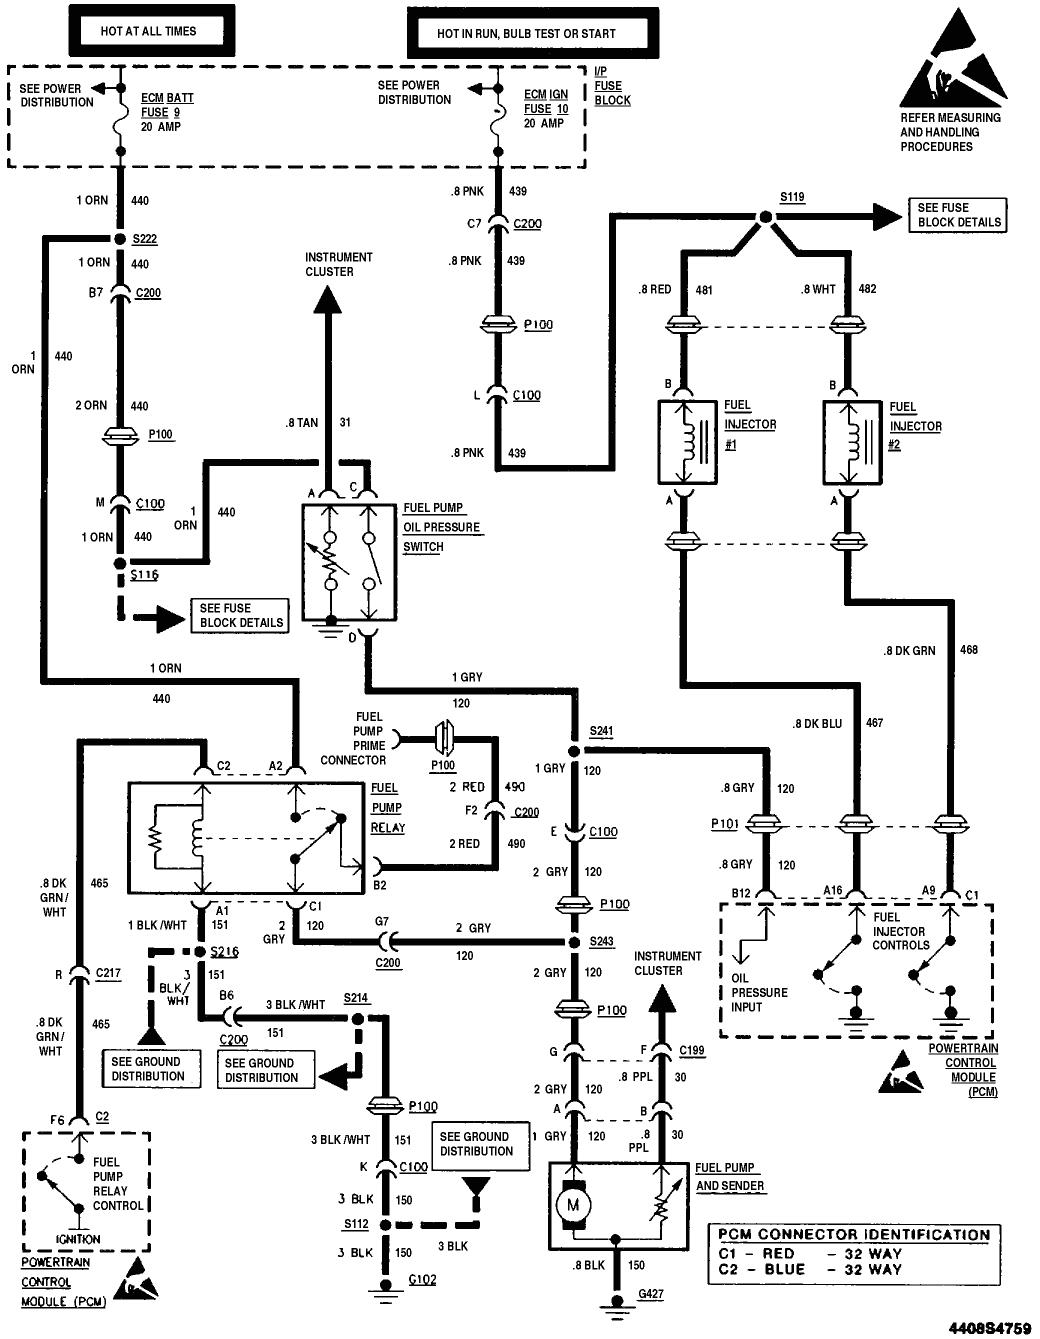 1995 chevy s10 wiring diagram wiring diagram expert 1995 chevrolet s 10 wiring diagram